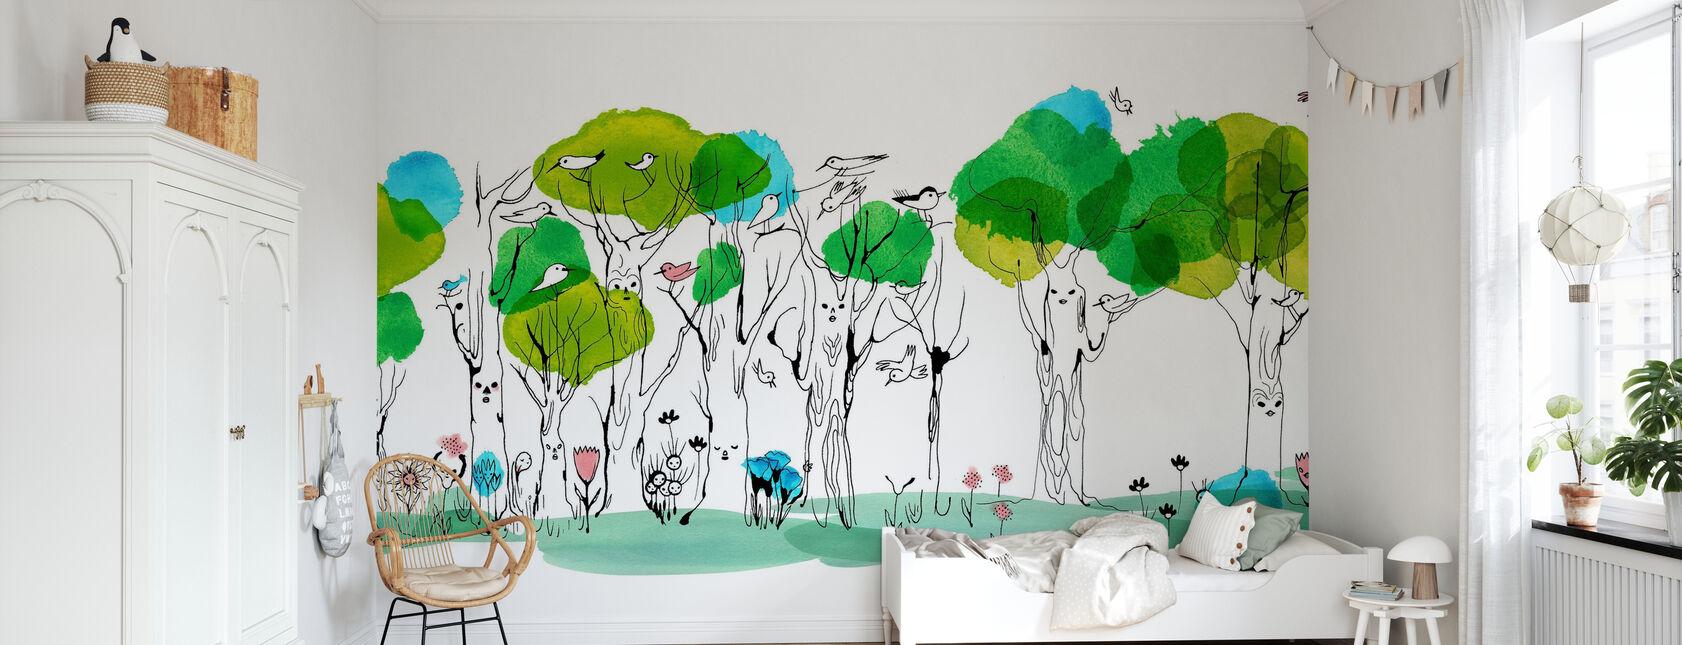 Flüsterender Baum - Tapete - Kinderzimmer